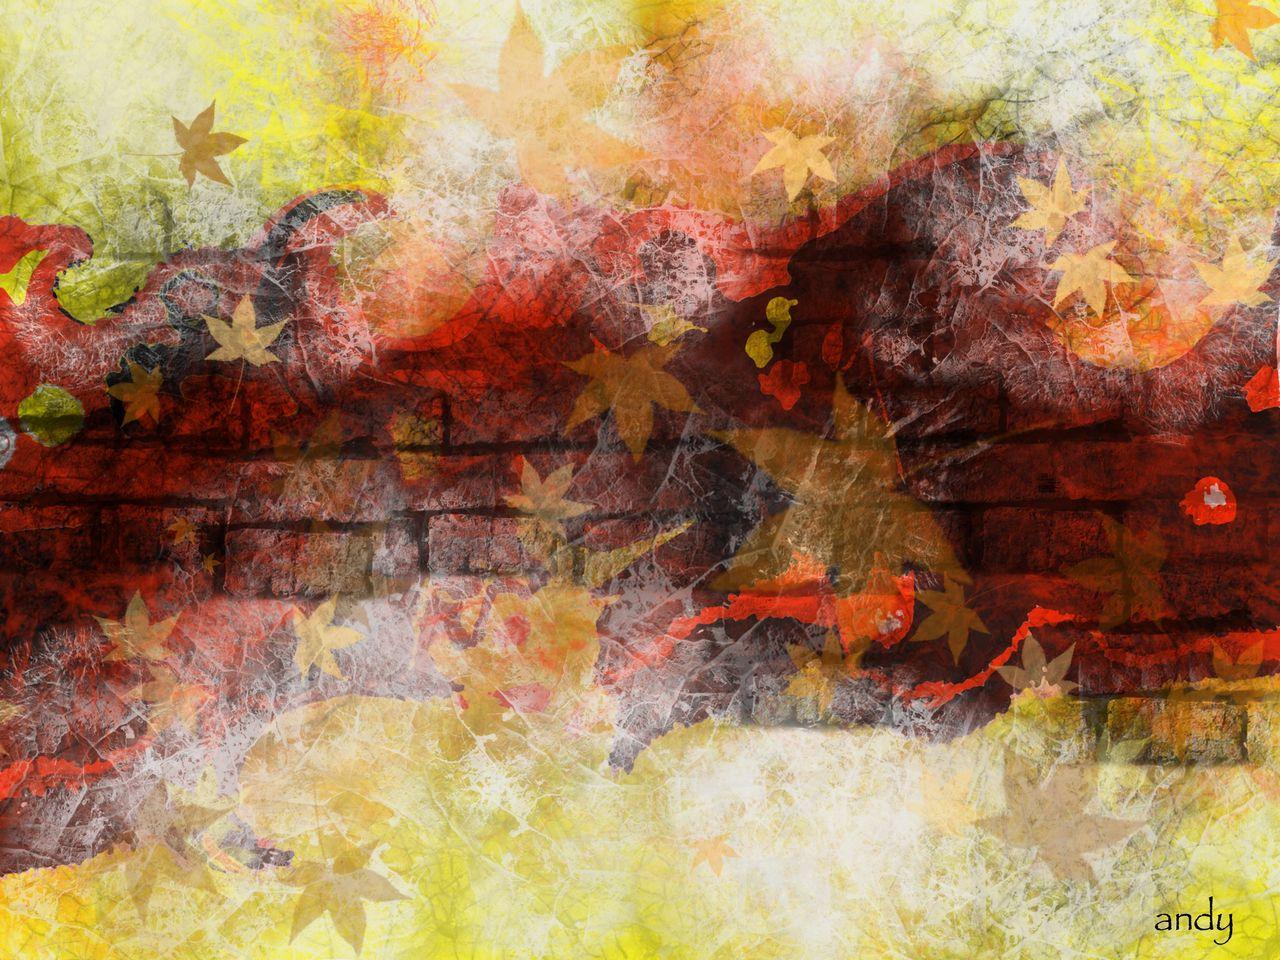 Herbst Atmosphare Abstrakte Kunst Natur Modern Abstrakt Von Andy46 Bei Kunstnet